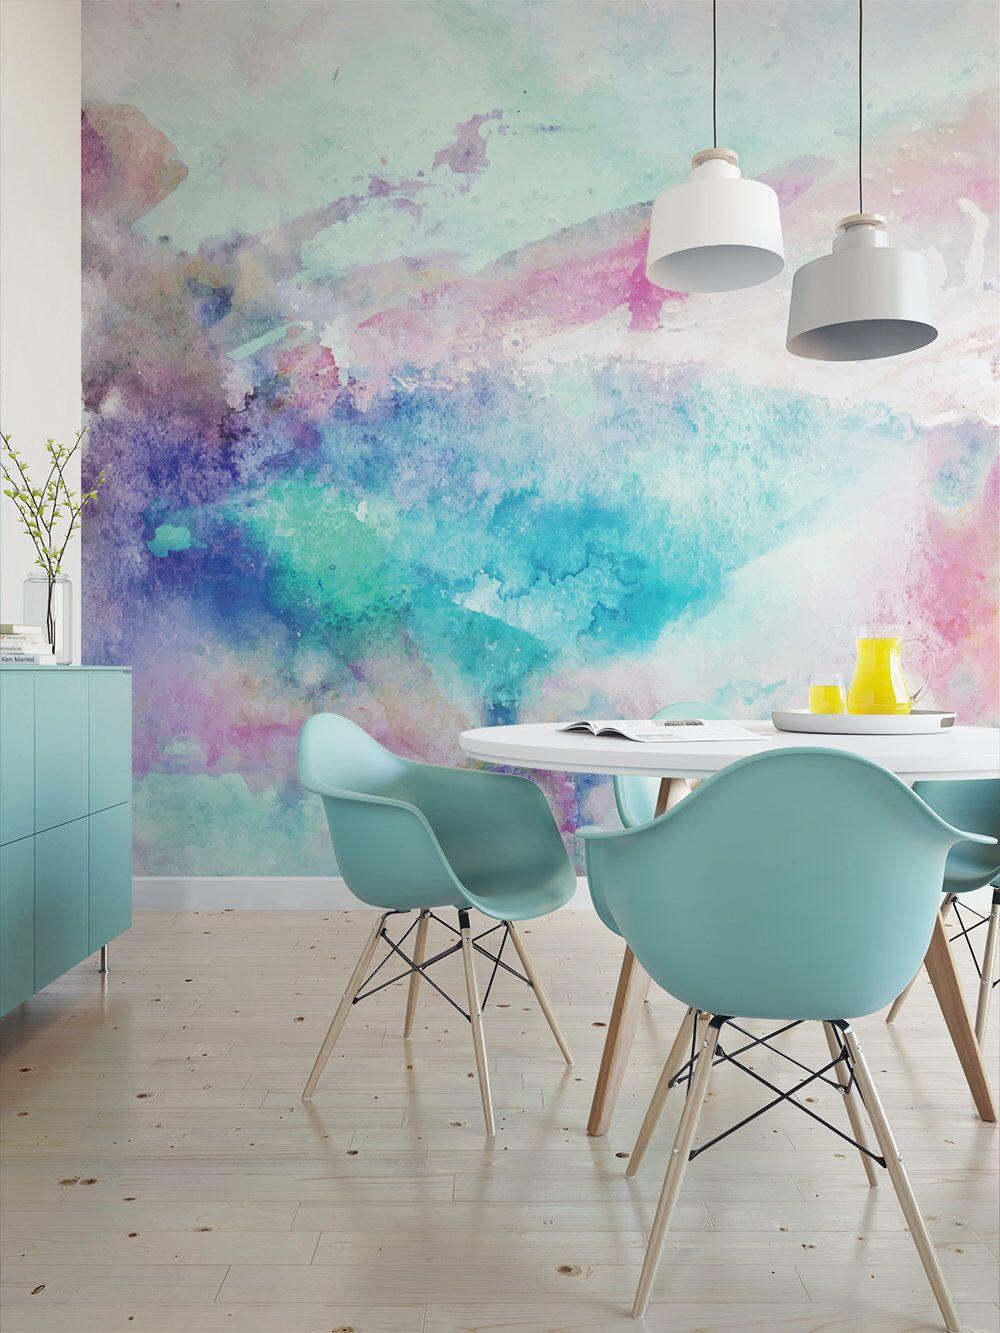 Cool Tones Watercolor Wall Mural 522 In 2021 Wall Wallpaper Decor Wall Design